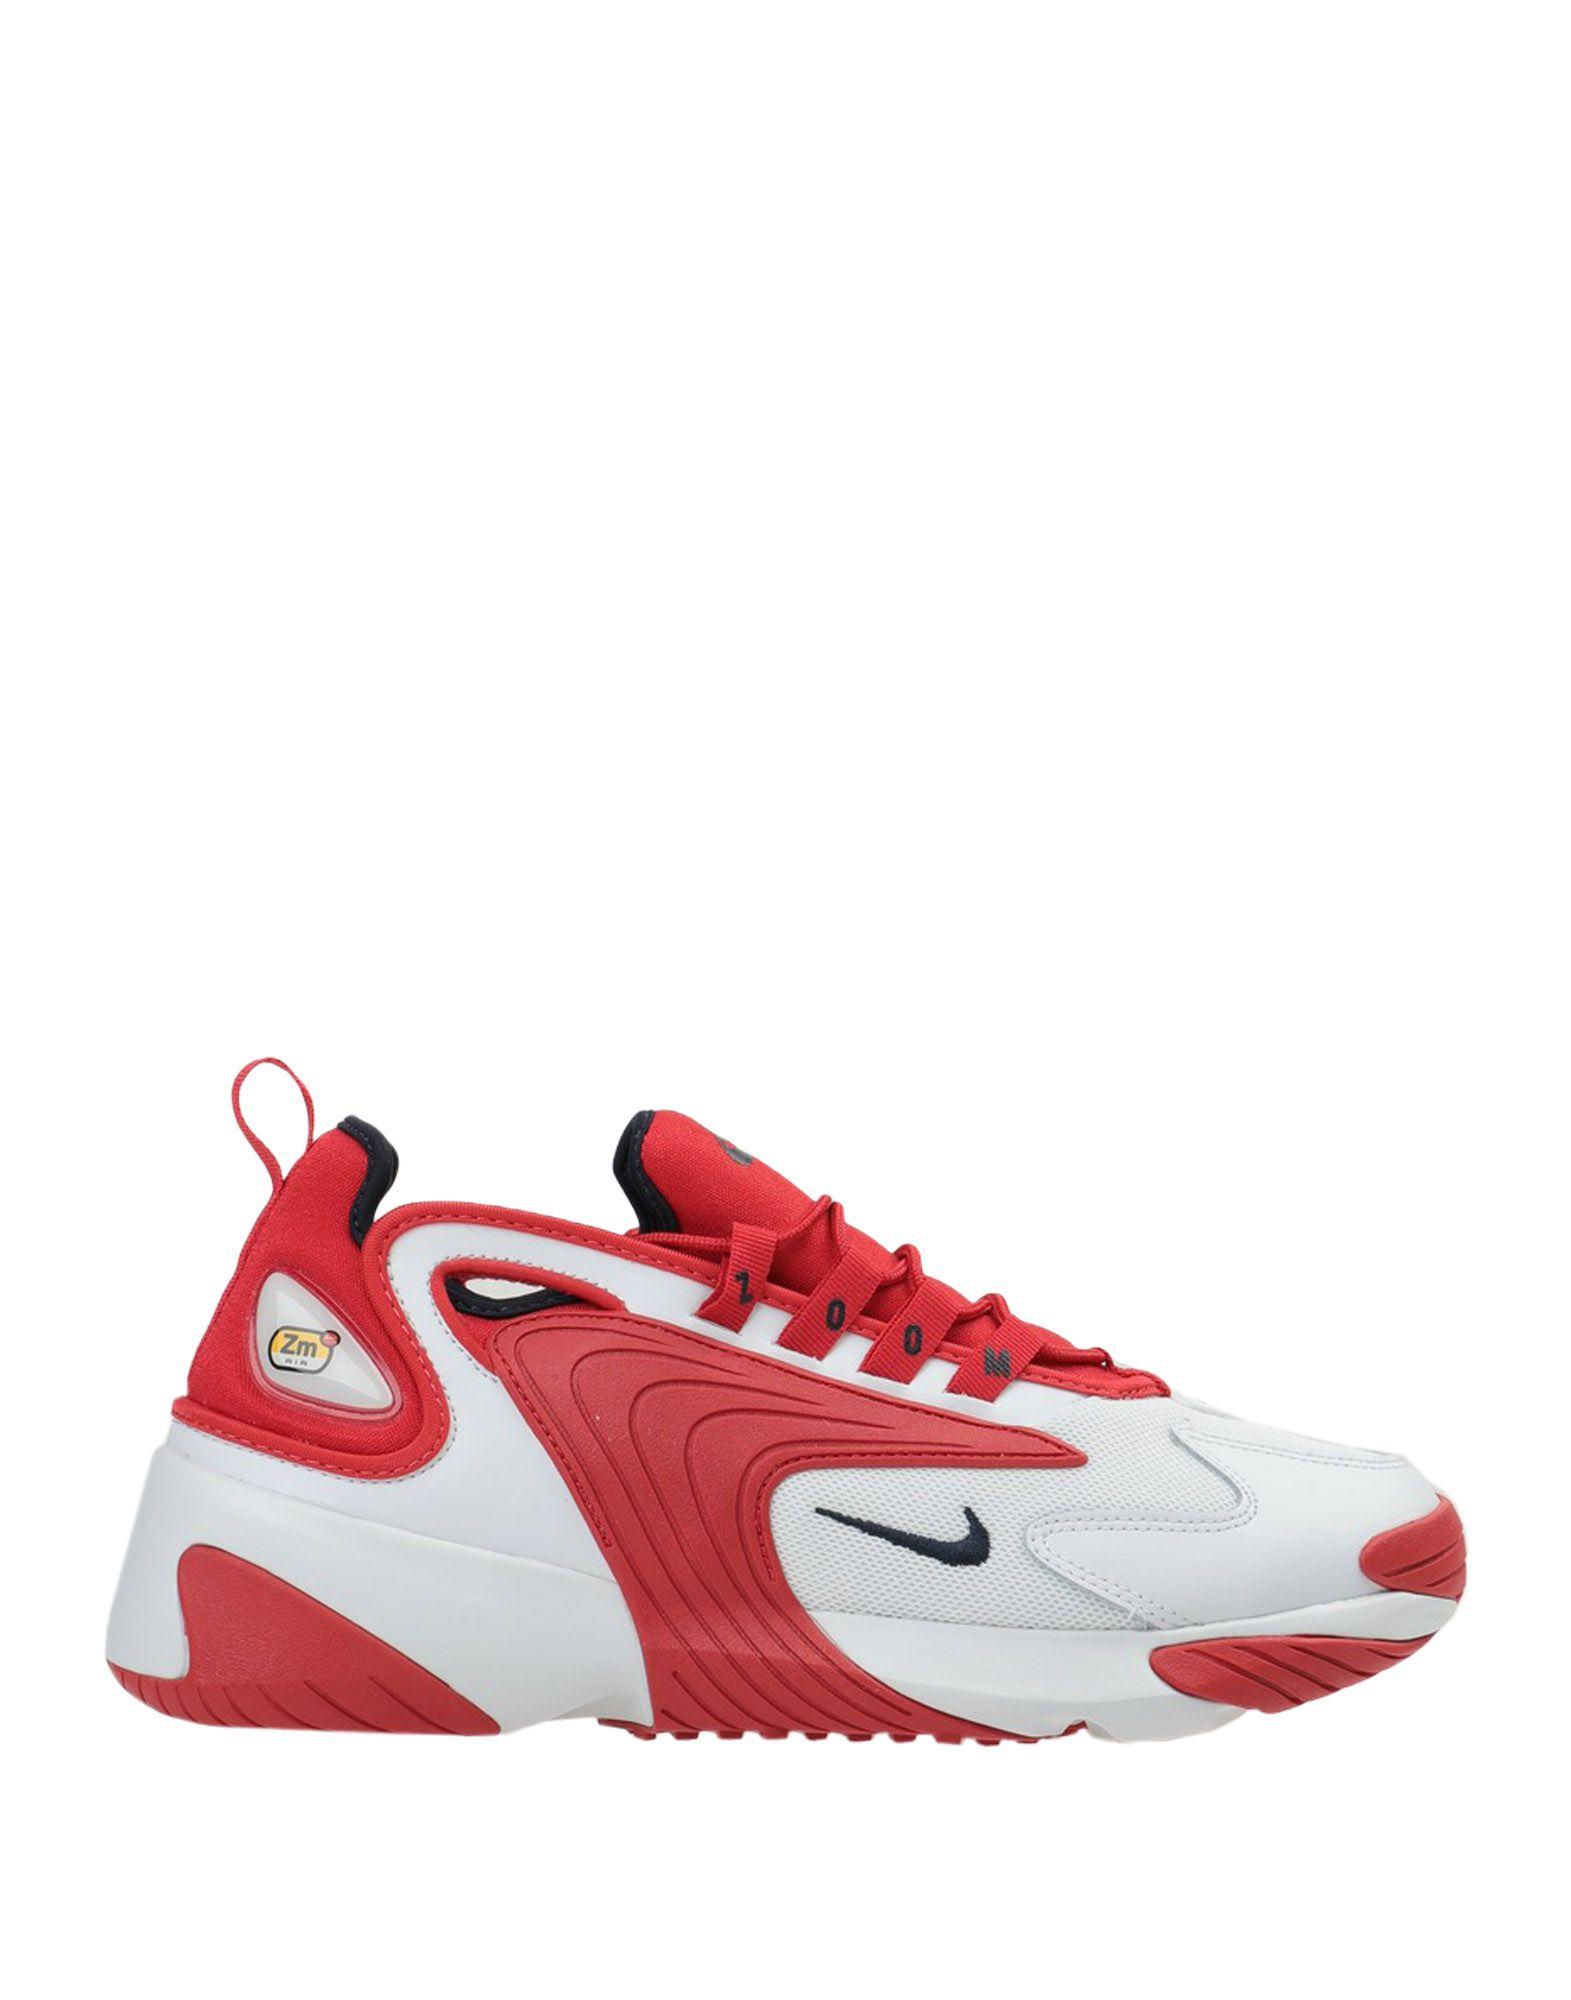 Turnschuhe Nike Zoom 2K - herren - 11670265UK